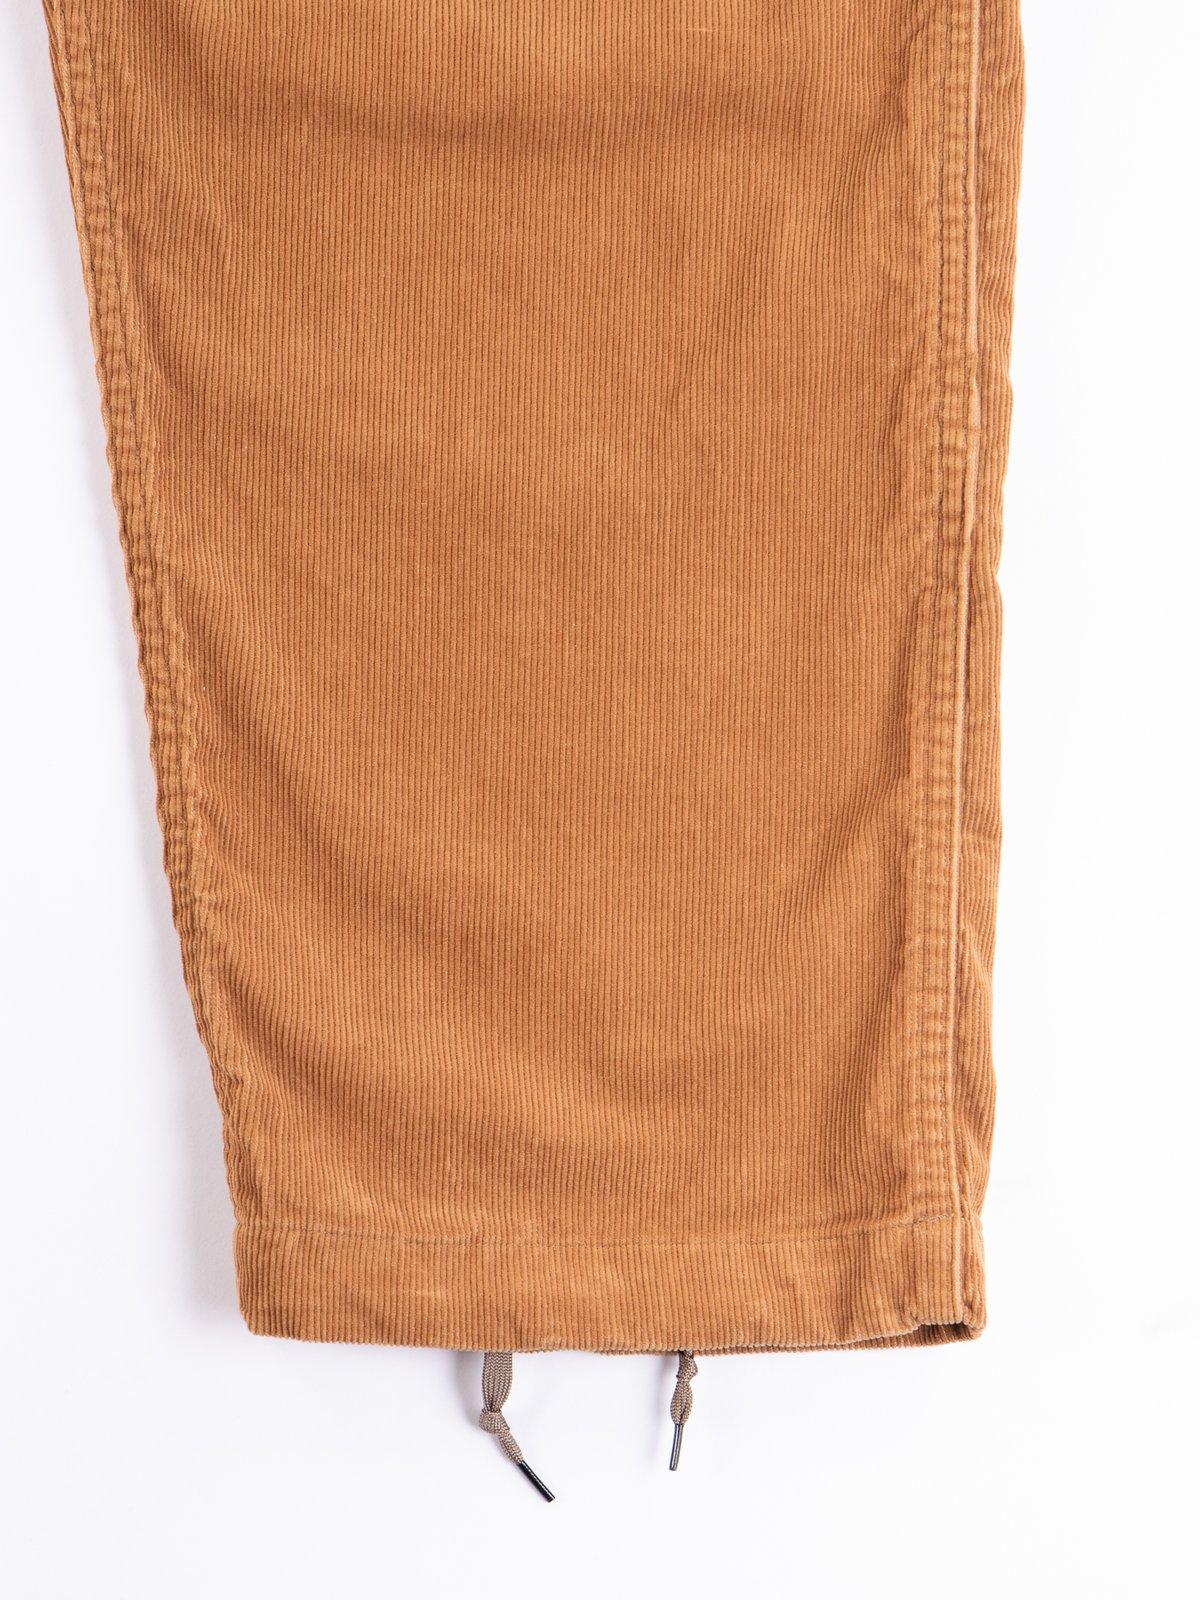 Brown Cord TBB Service Pant - Image 5